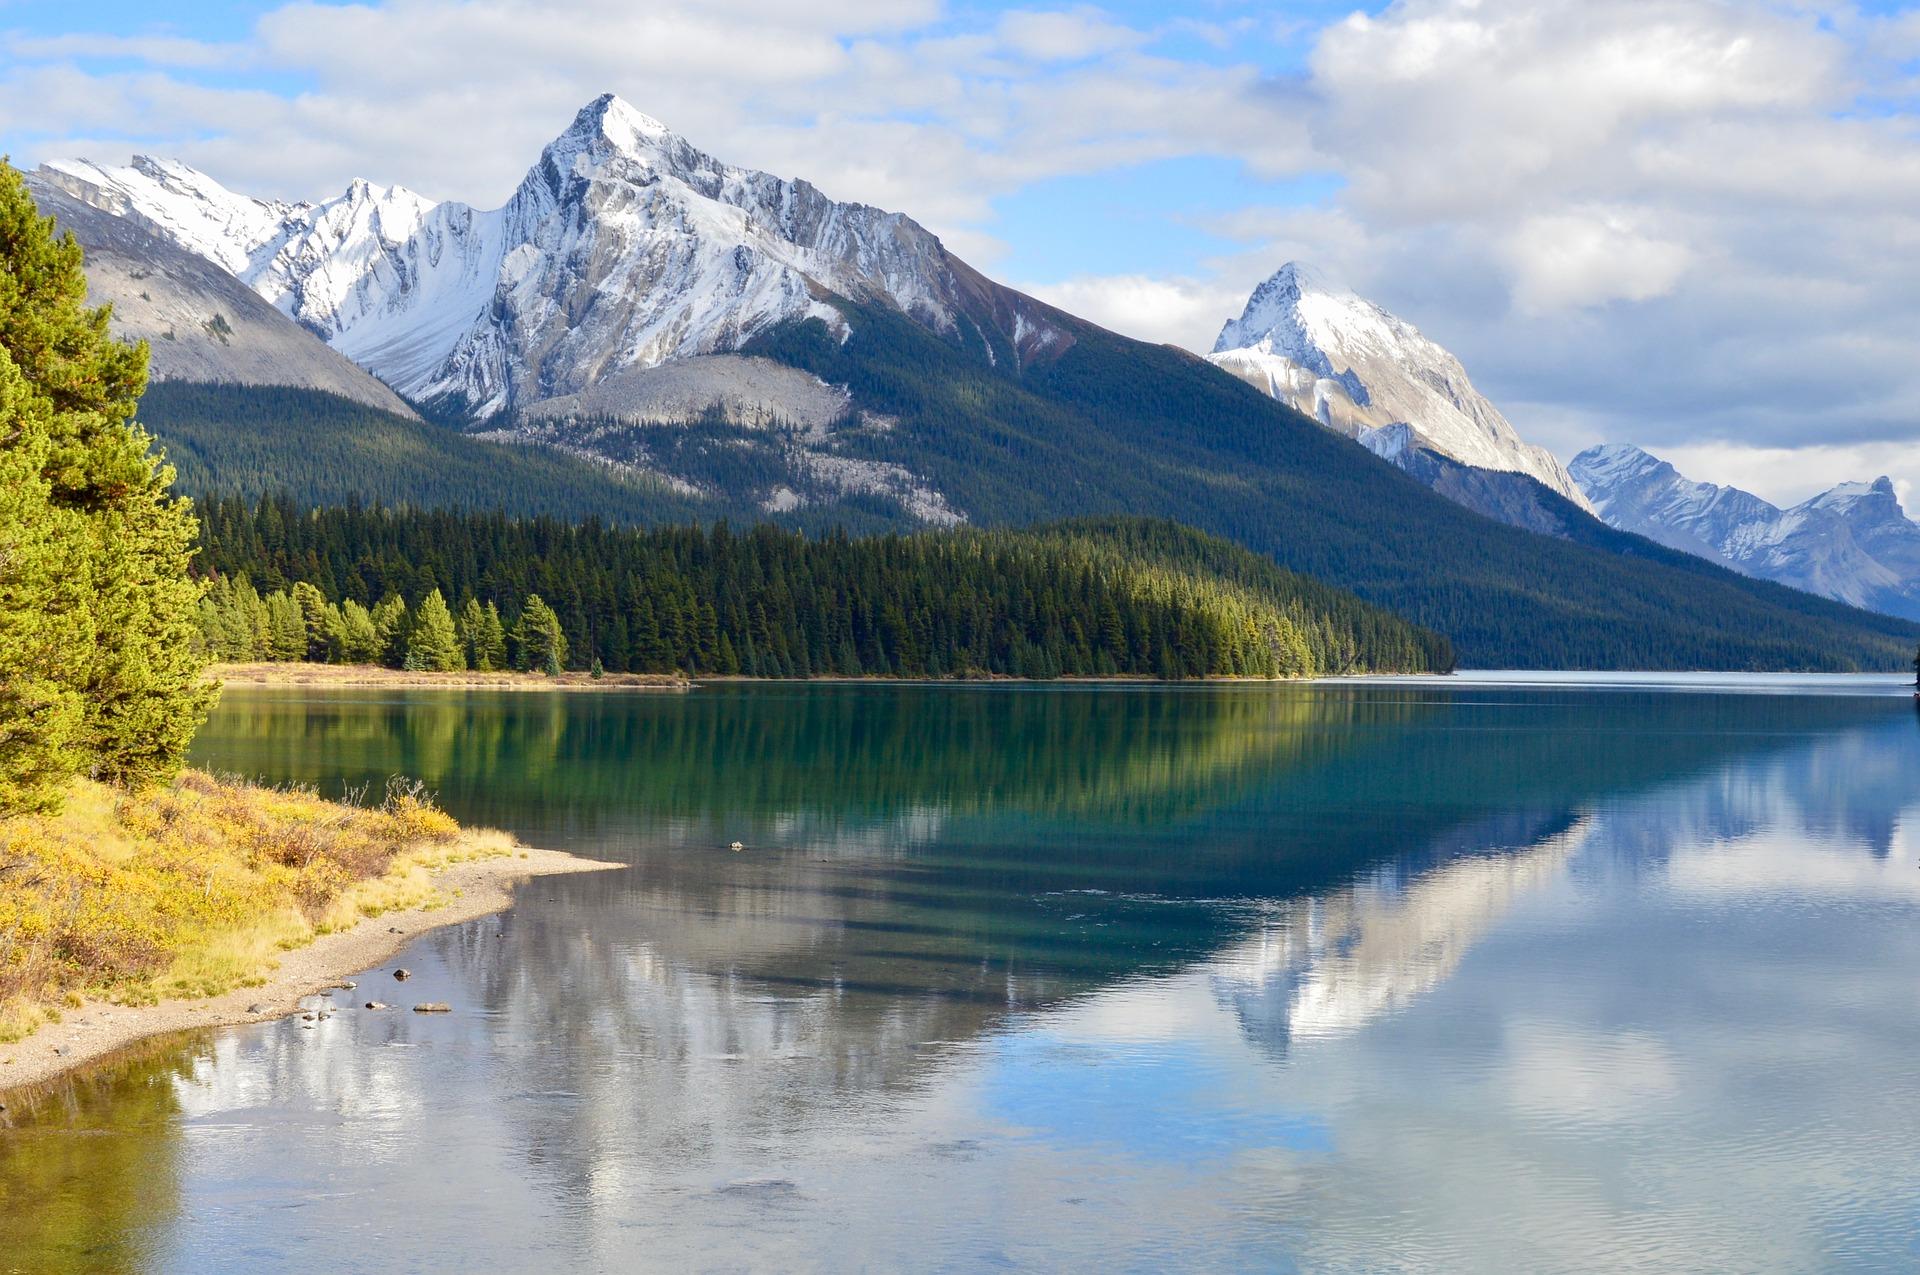 Spectacular Canadian Rockies | Maligne Lake, Jasper, Canada